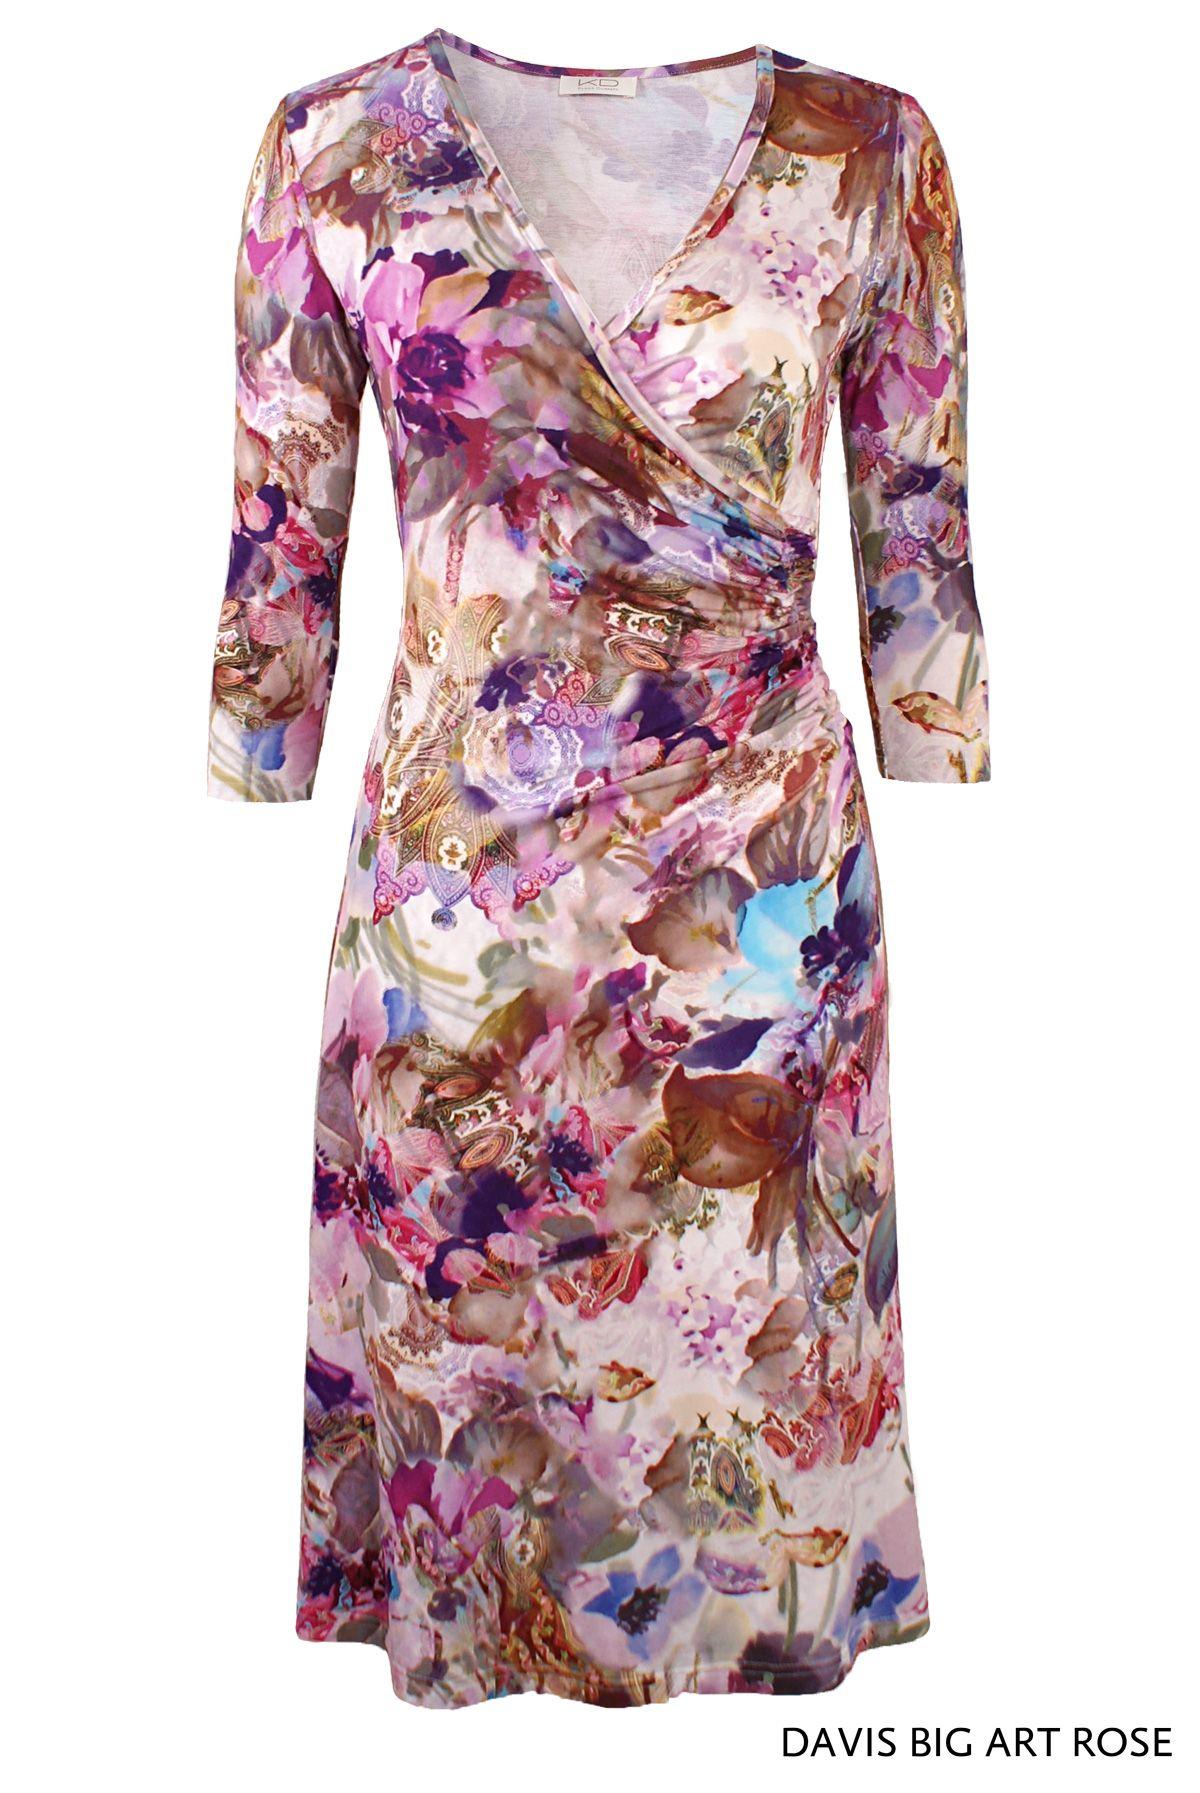 Davis Big Art Rose von KD Klaus Dilkrath #davis #dress #big #art ...